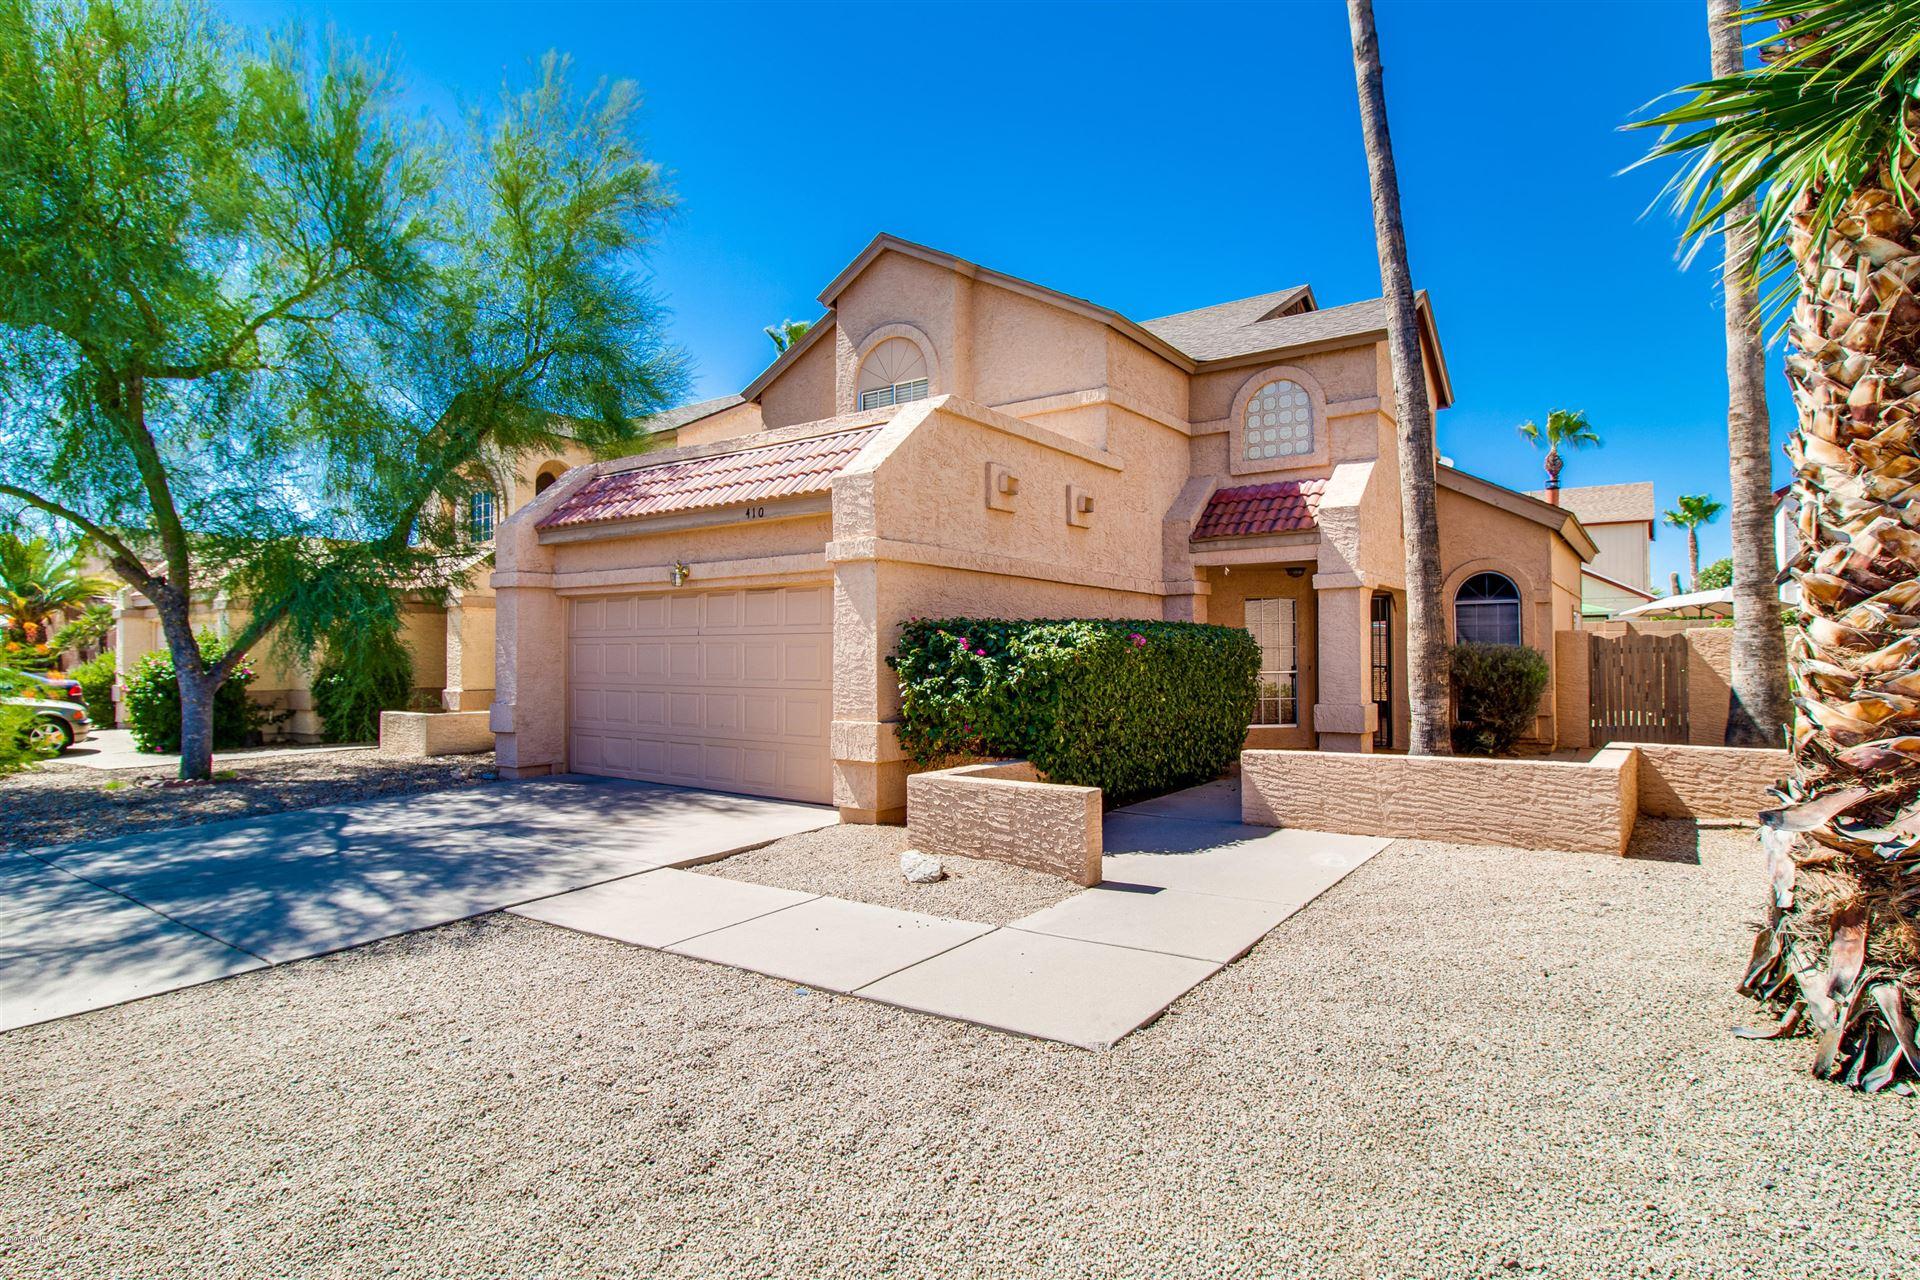 410 E TOPEKA Drive, Phoenix, AZ 85024 - #: 6101727